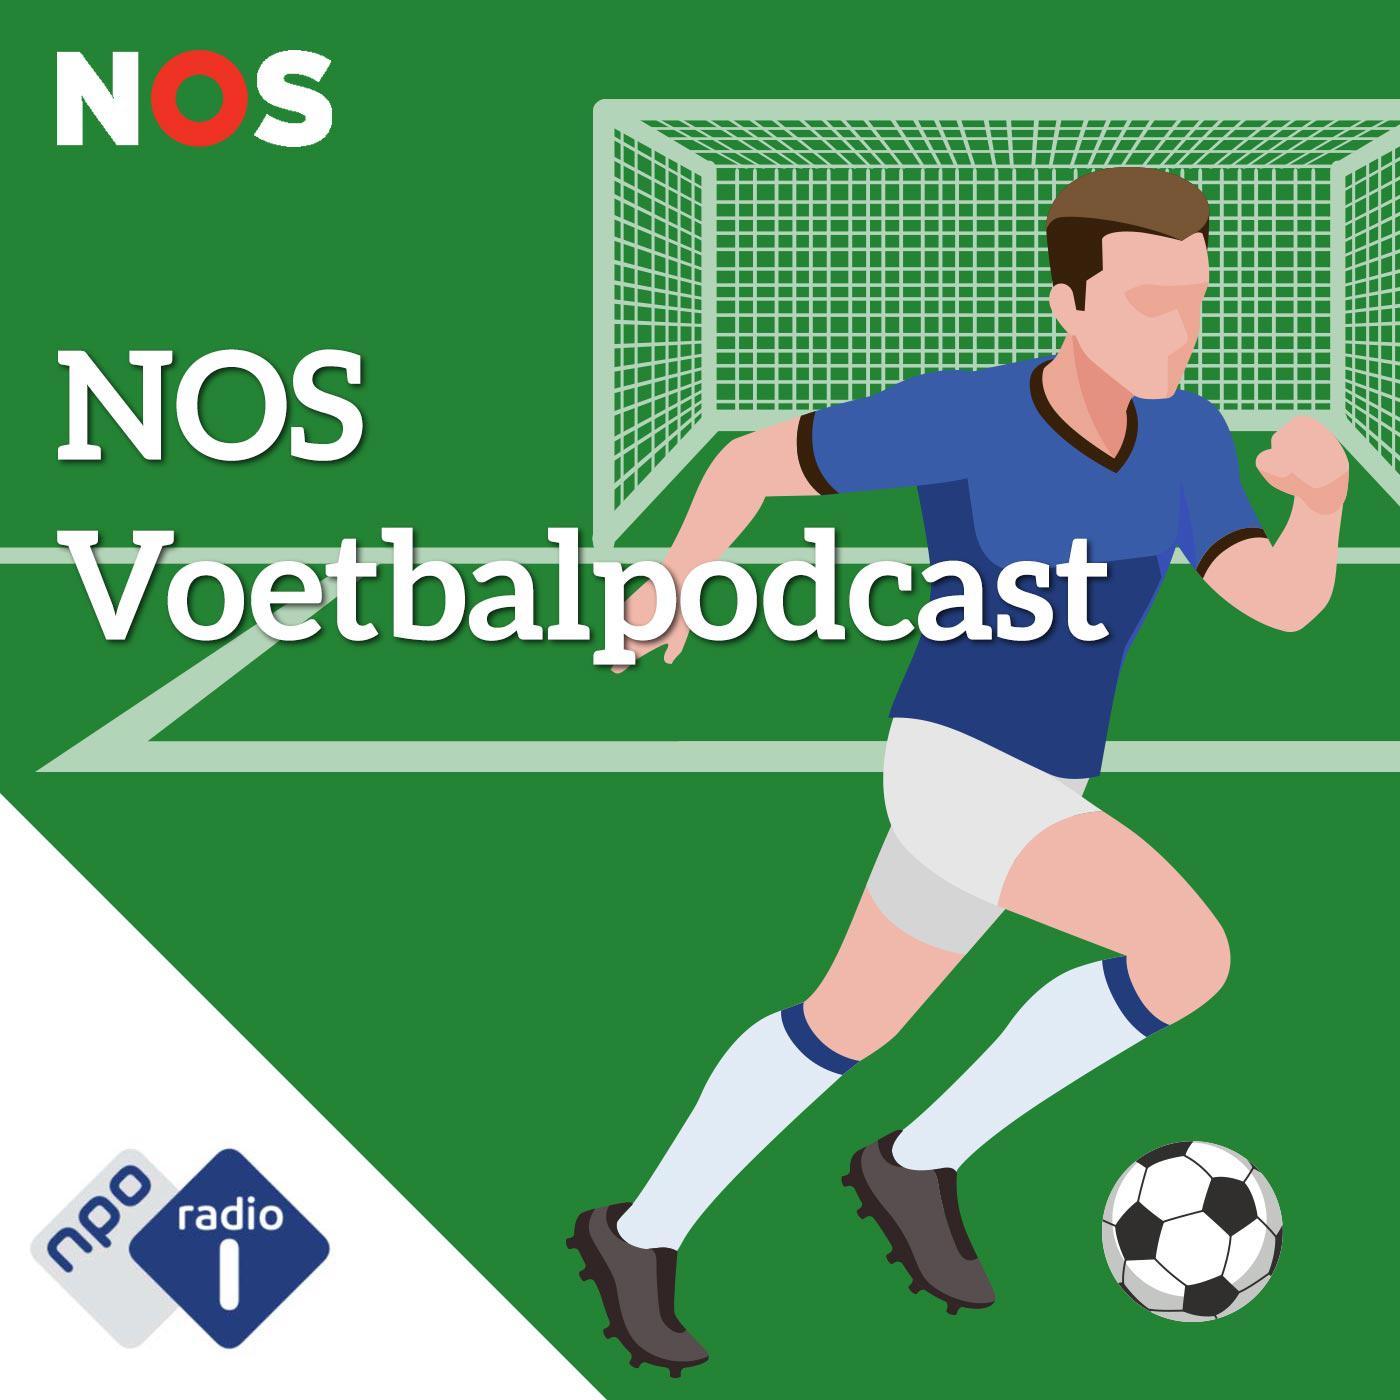 6. NOS Voetbalpodcast - NOS